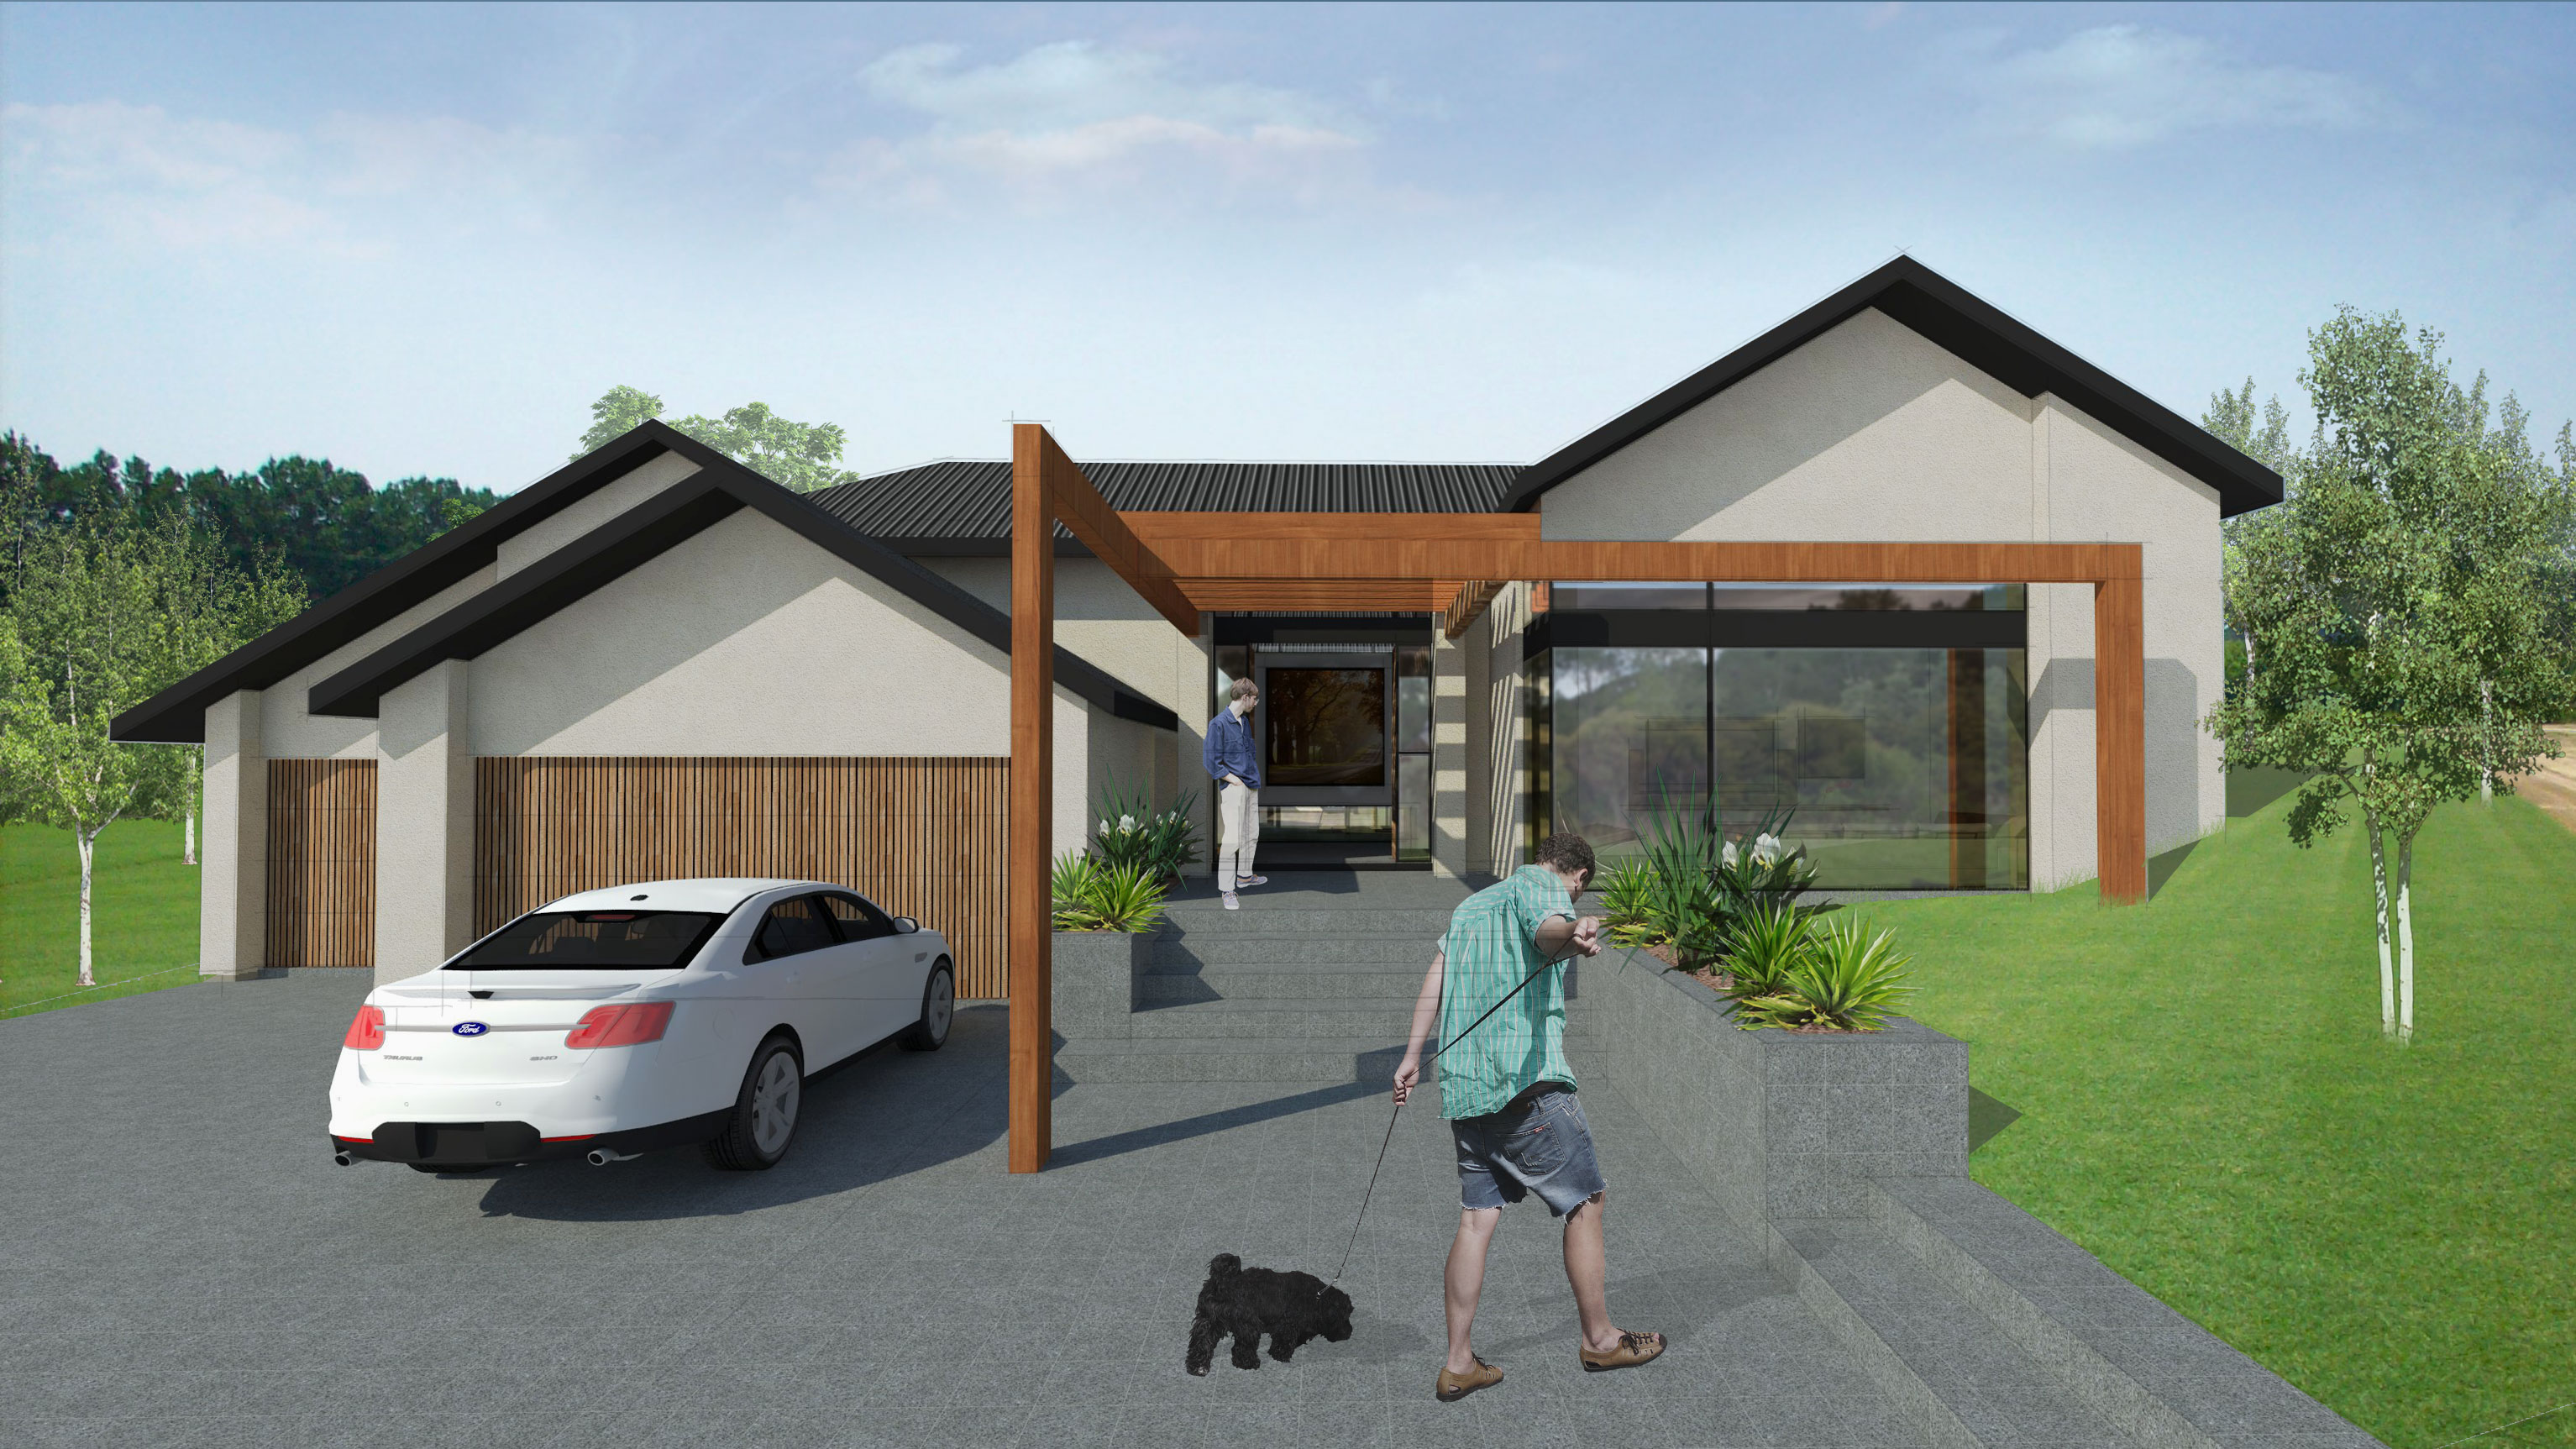 Norx, Lot 28, 17 Tau Rd, Flat Bush, 3D Render1